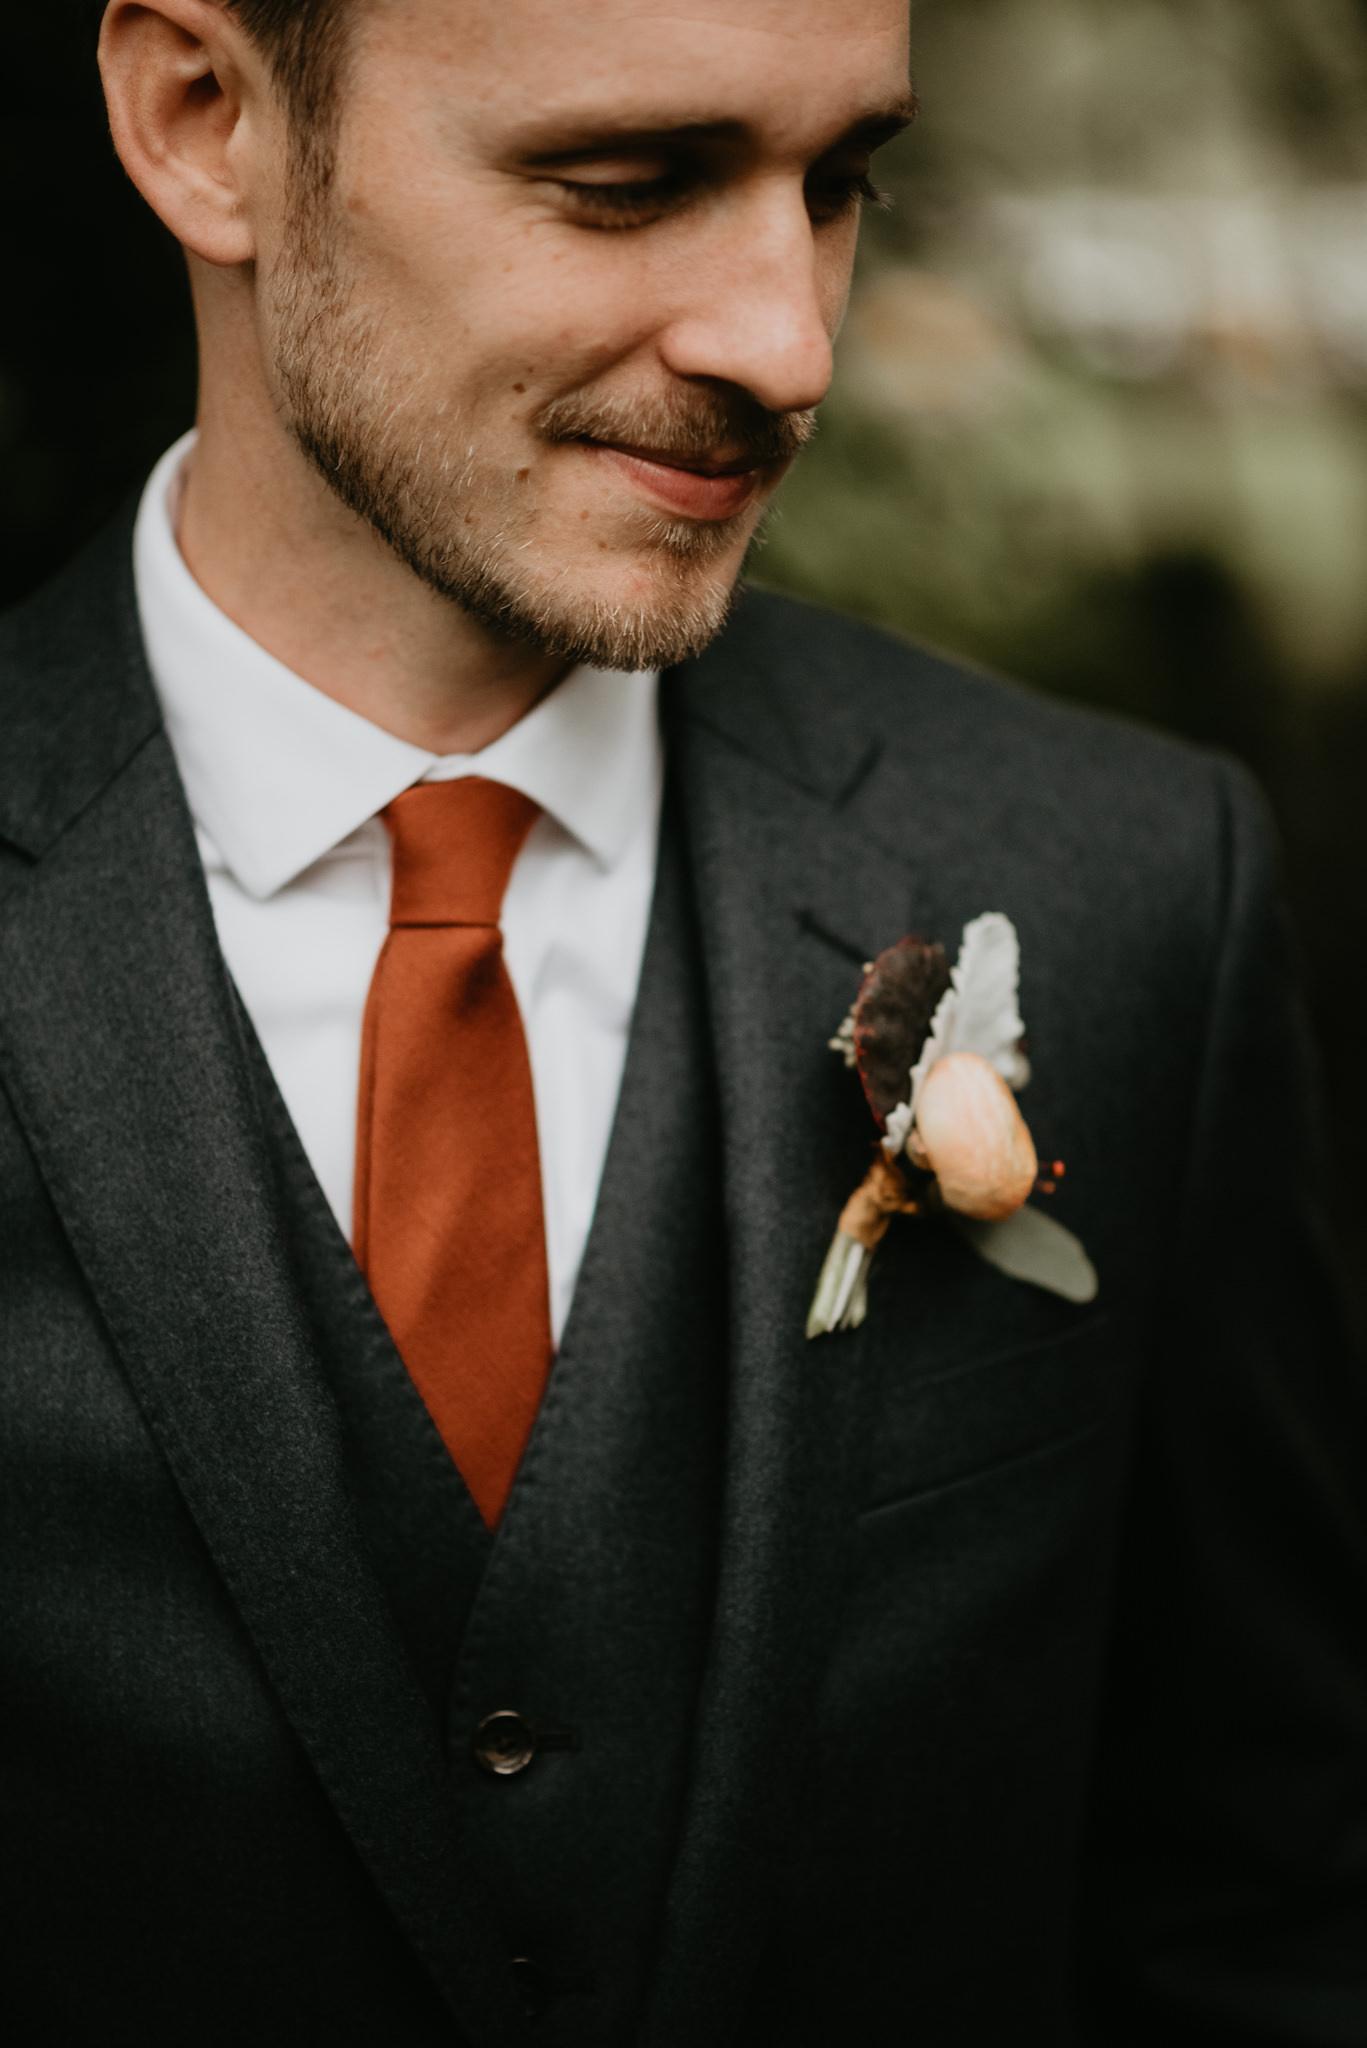 Sundara - Weddings - Virginia - Best Wedding Photographer - Pat Cori Photography-29.jpg